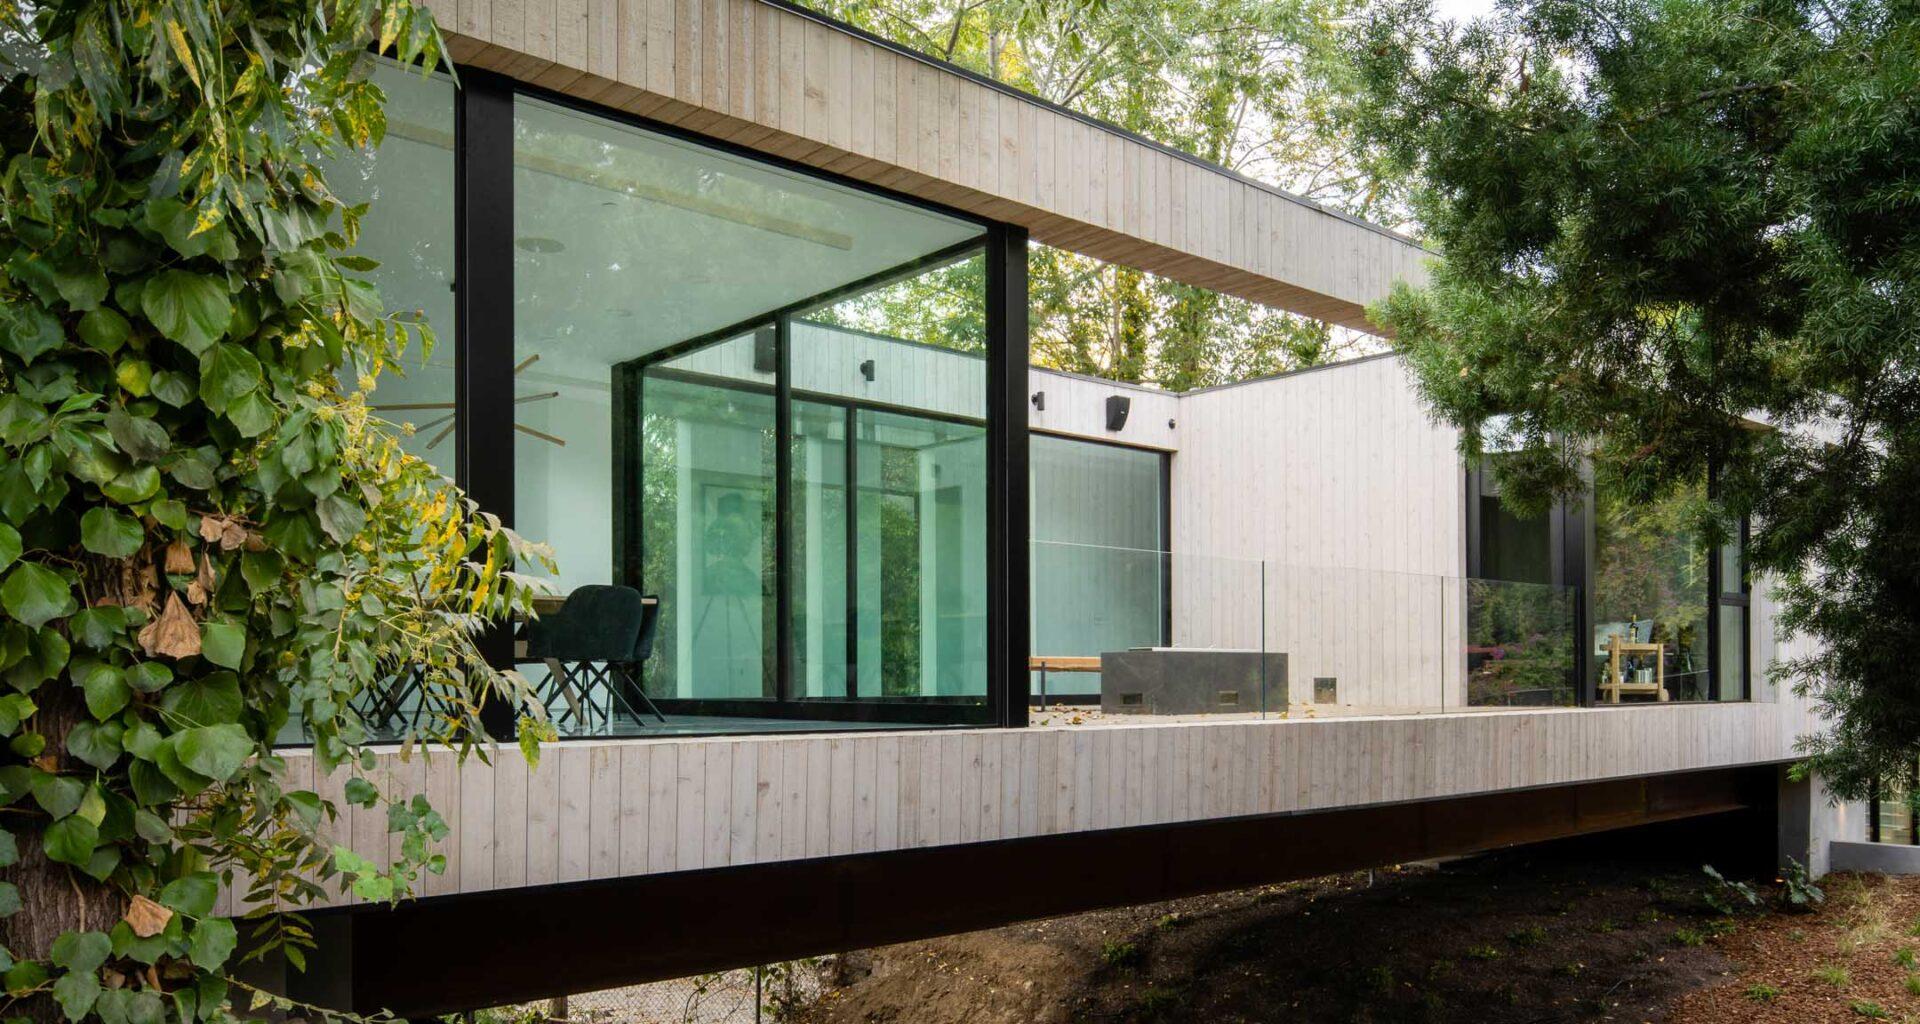 Dan Brunn, Dan Brunn Architecture,